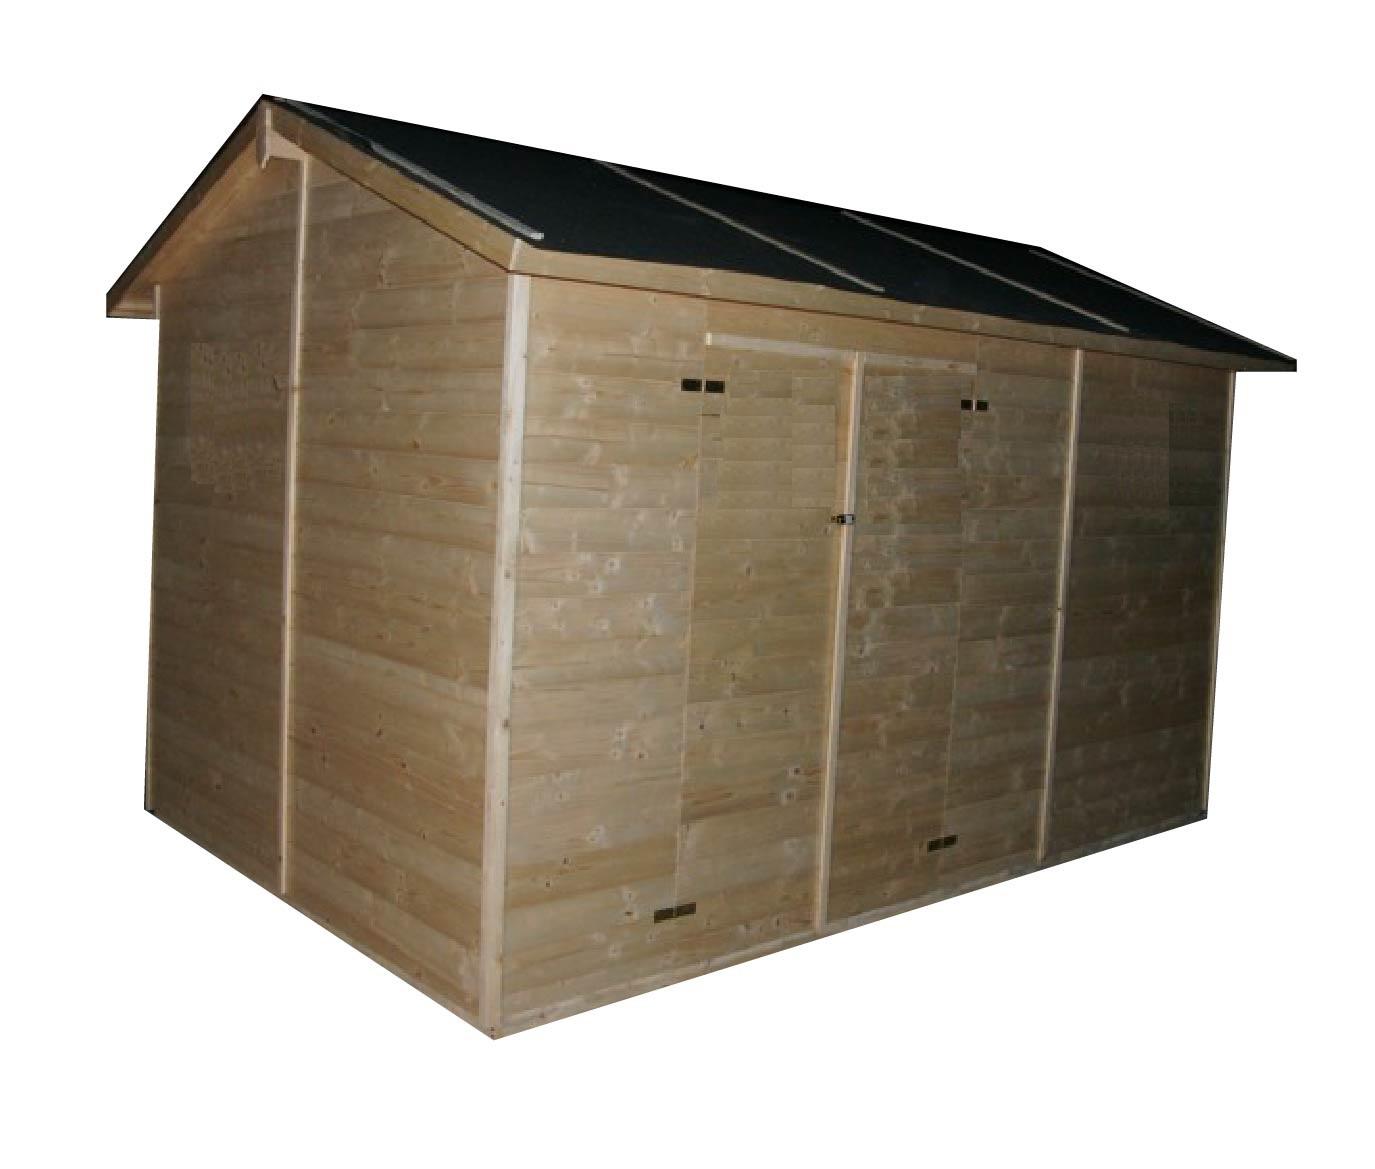 gartenh user bis 12 m2 gartenhaus aus holz 3 3m x 3 9m 19mm calpe ger tehaus cadema. Black Bedroom Furniture Sets. Home Design Ideas